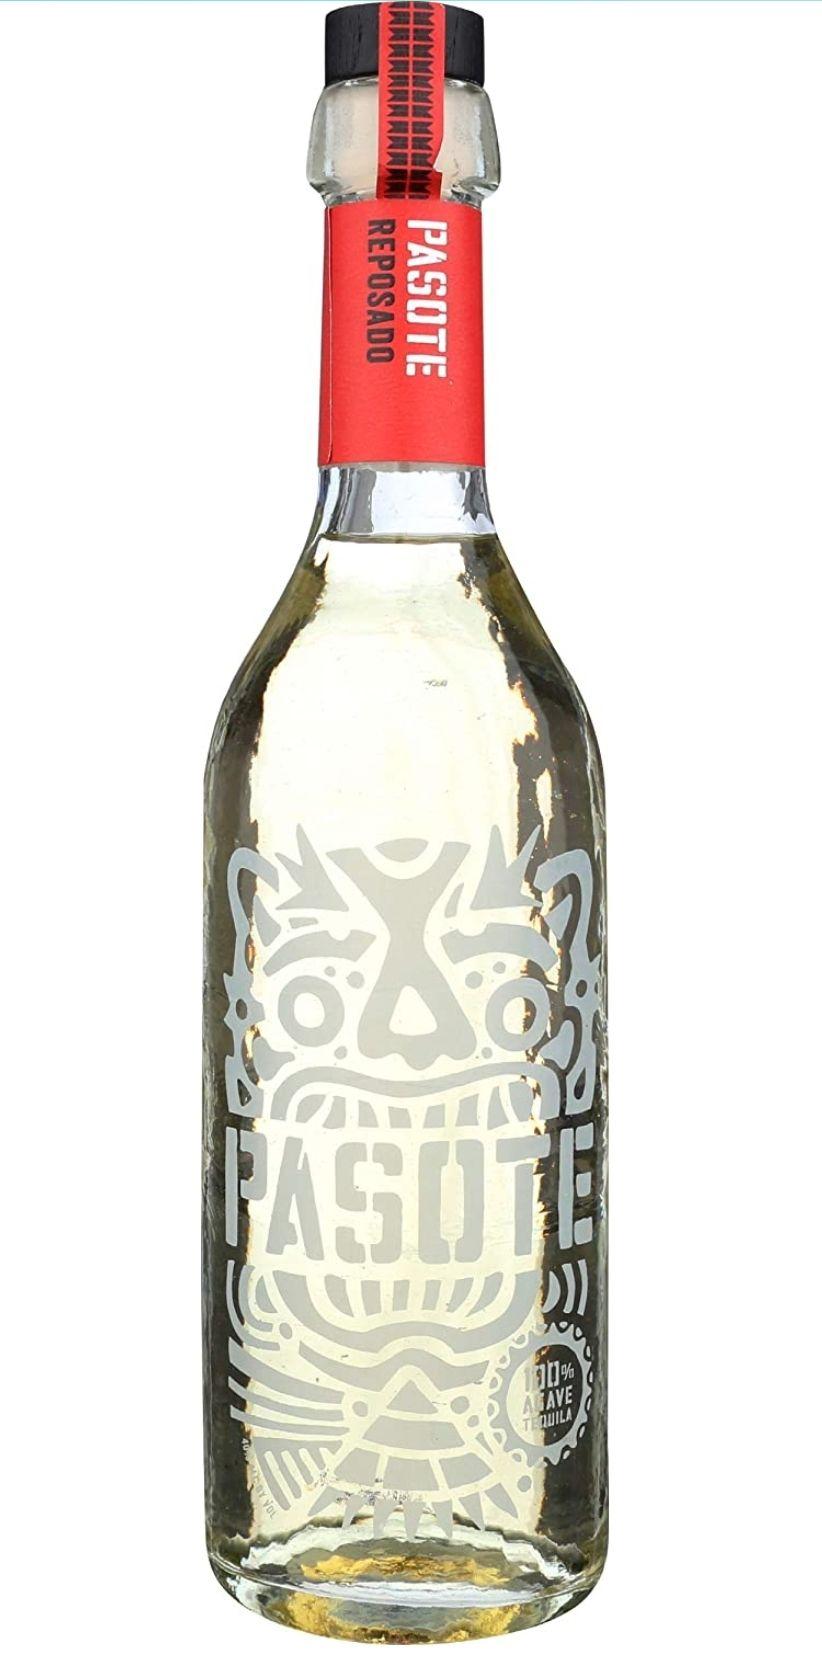 PASOTE Reposado Tequila, 75 cl £24.63 at Amazon